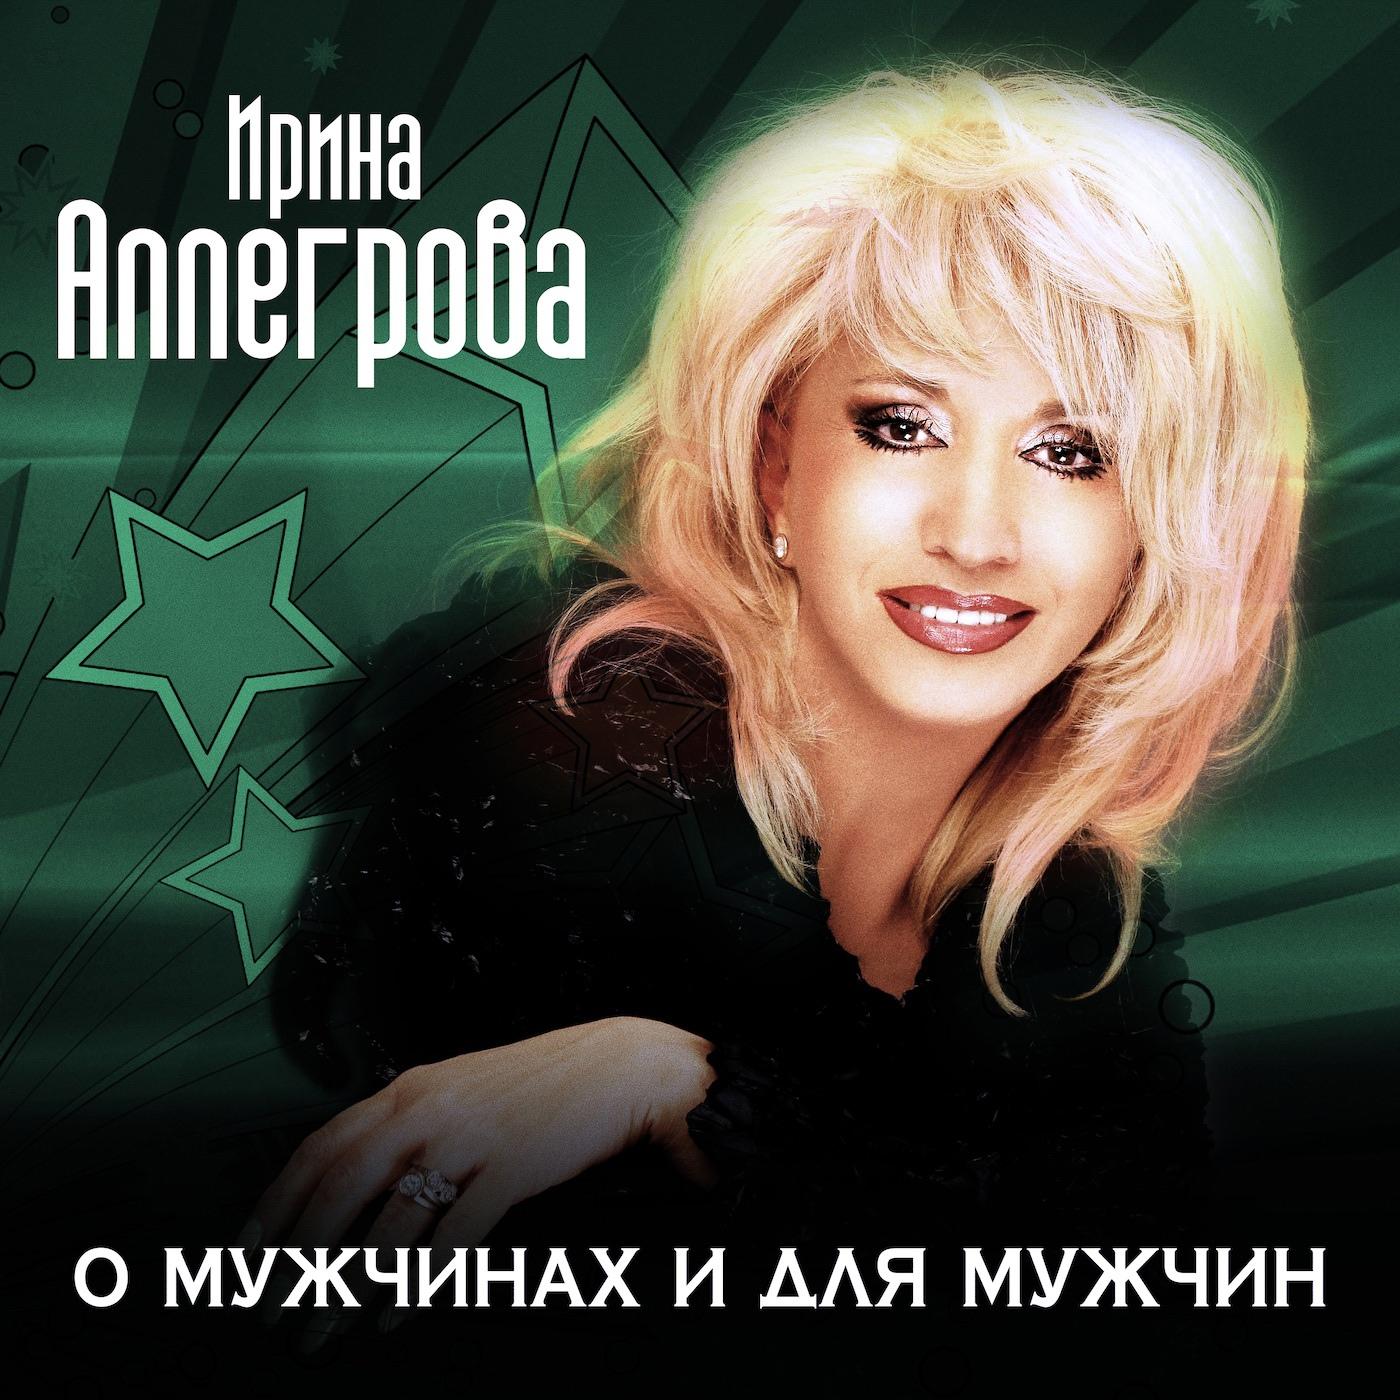 Ирина Аллегрова